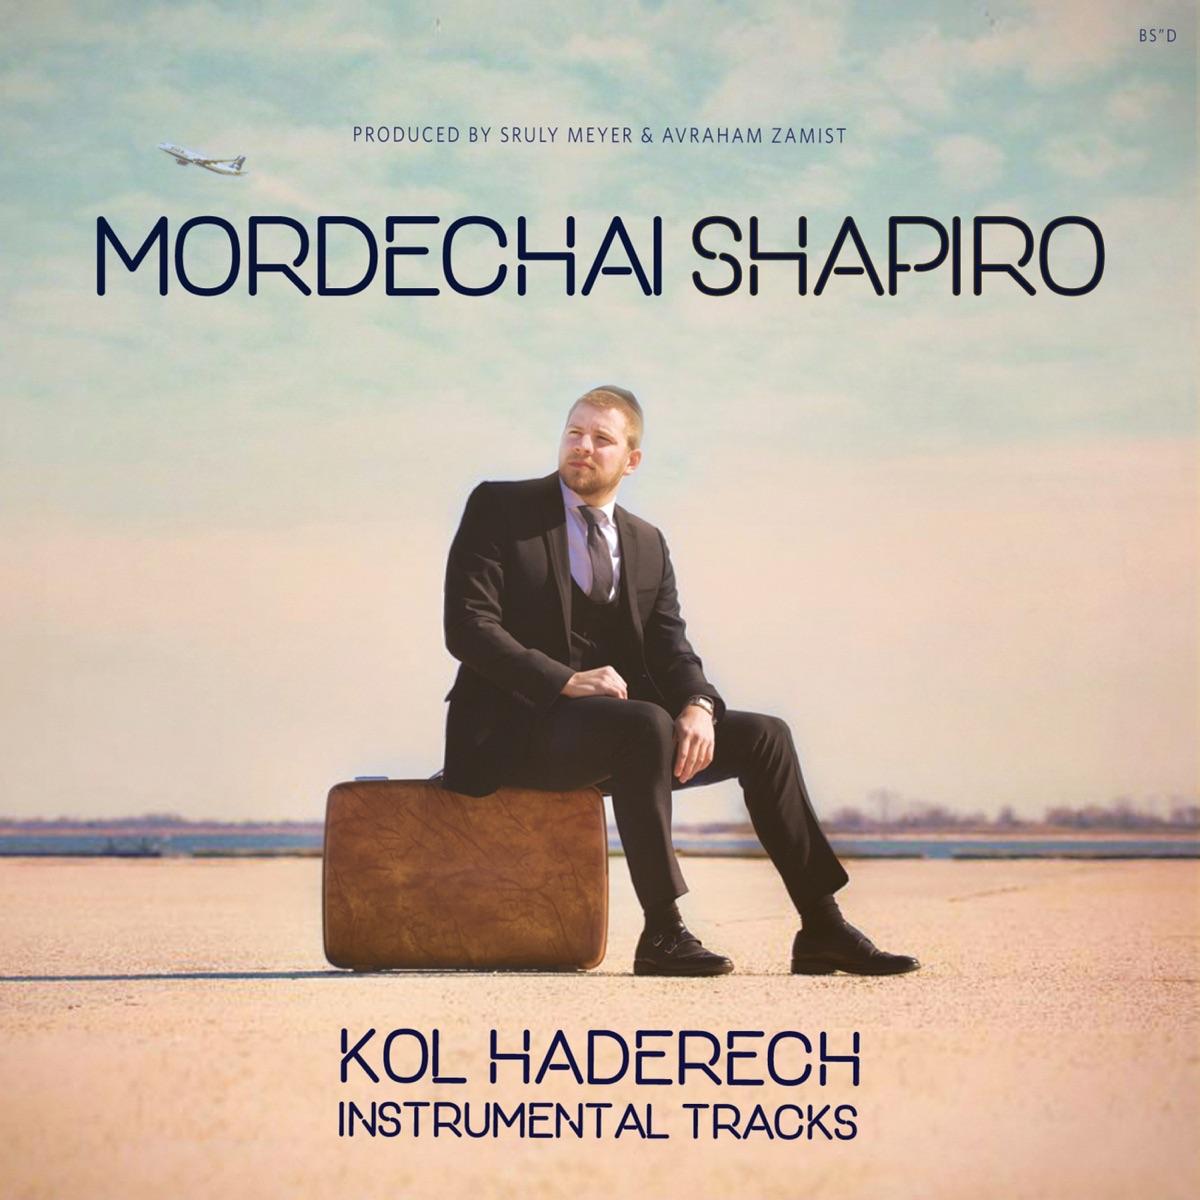 Kol Haderech Instrumental Mordechai Shapiro CD cover